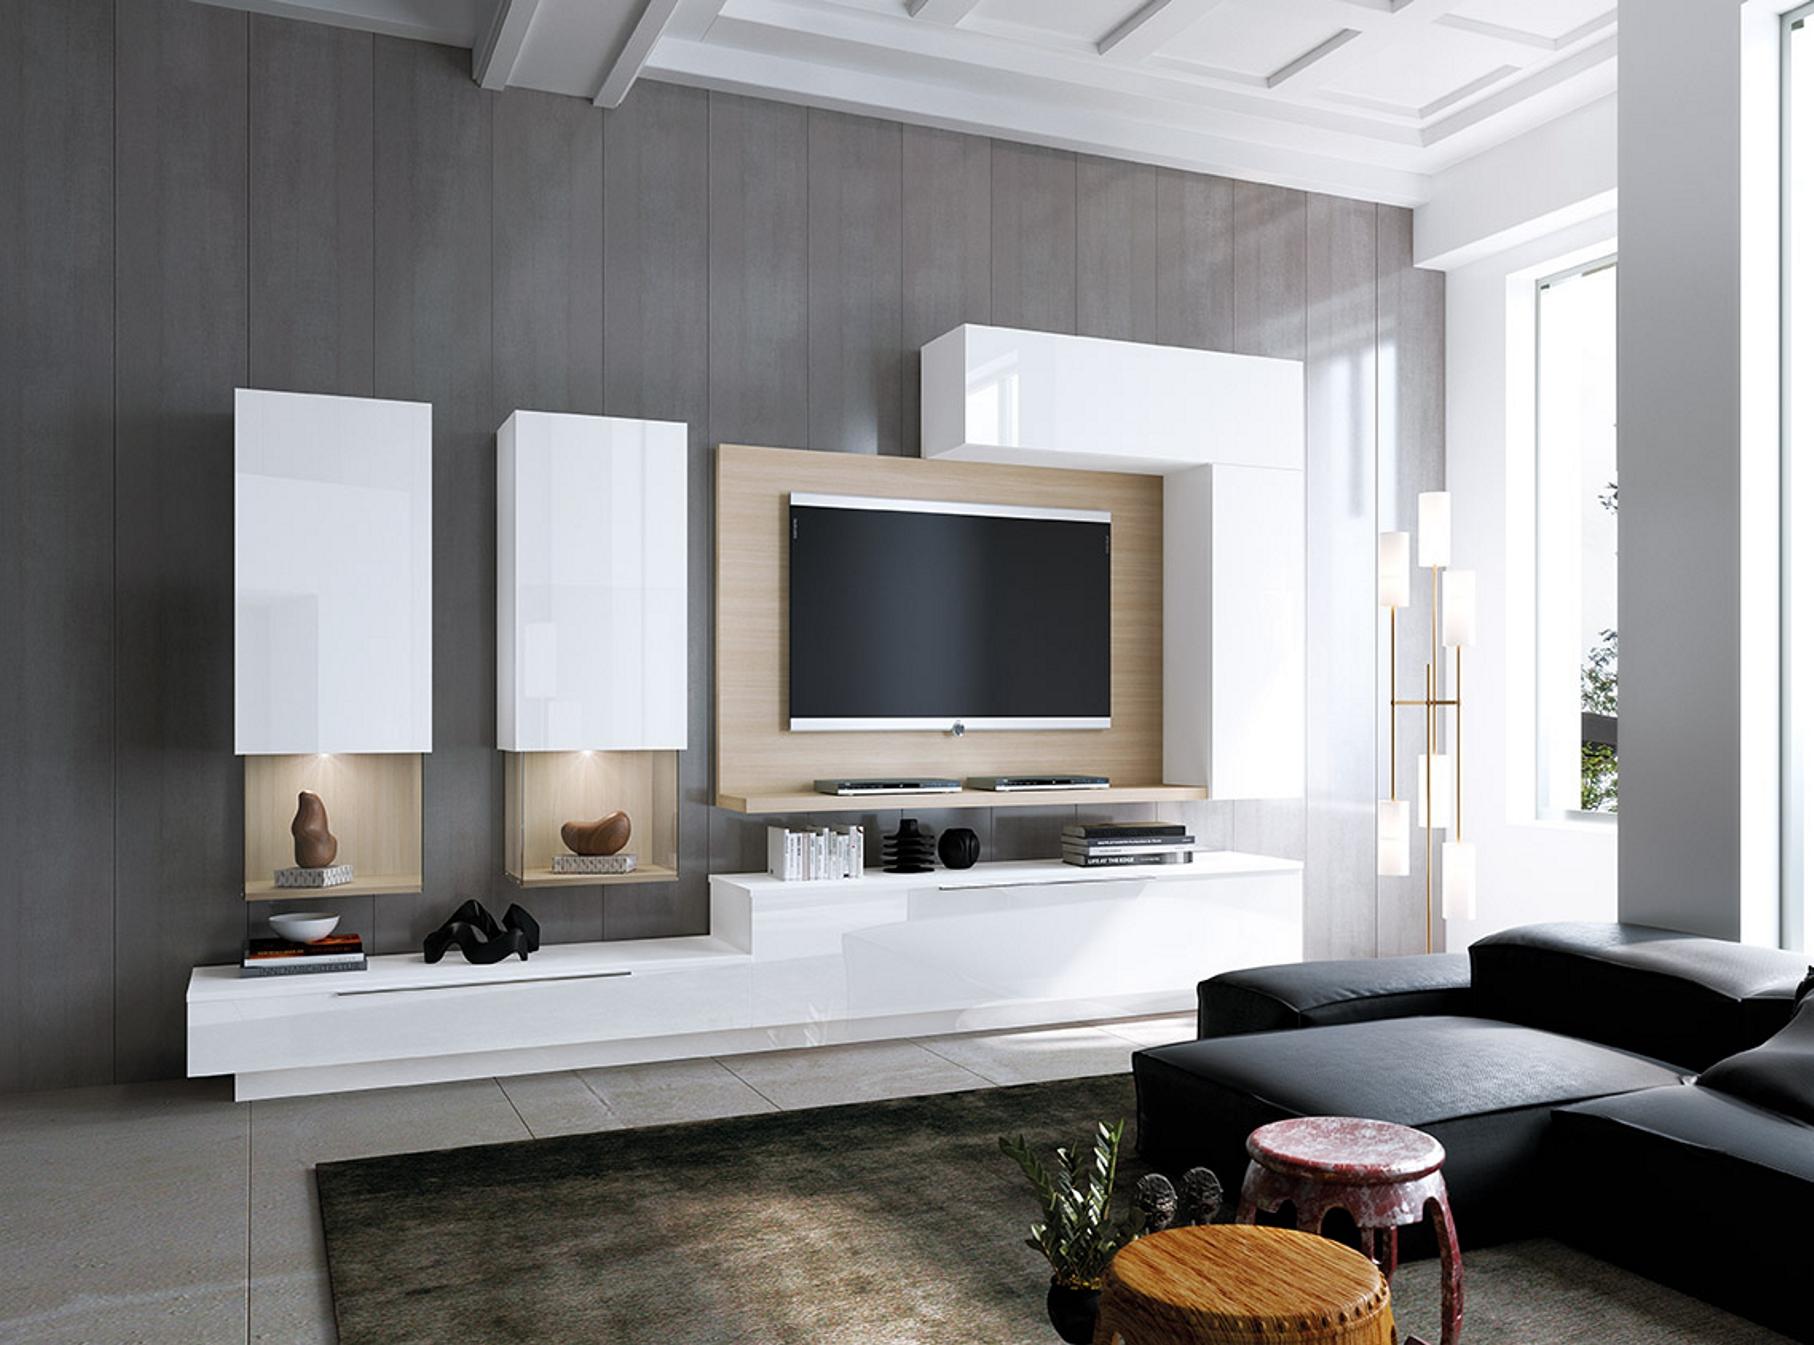 salon-moderno-Zion-3.0-muebles-paco-caballero-0907-5c8d32e4cf575